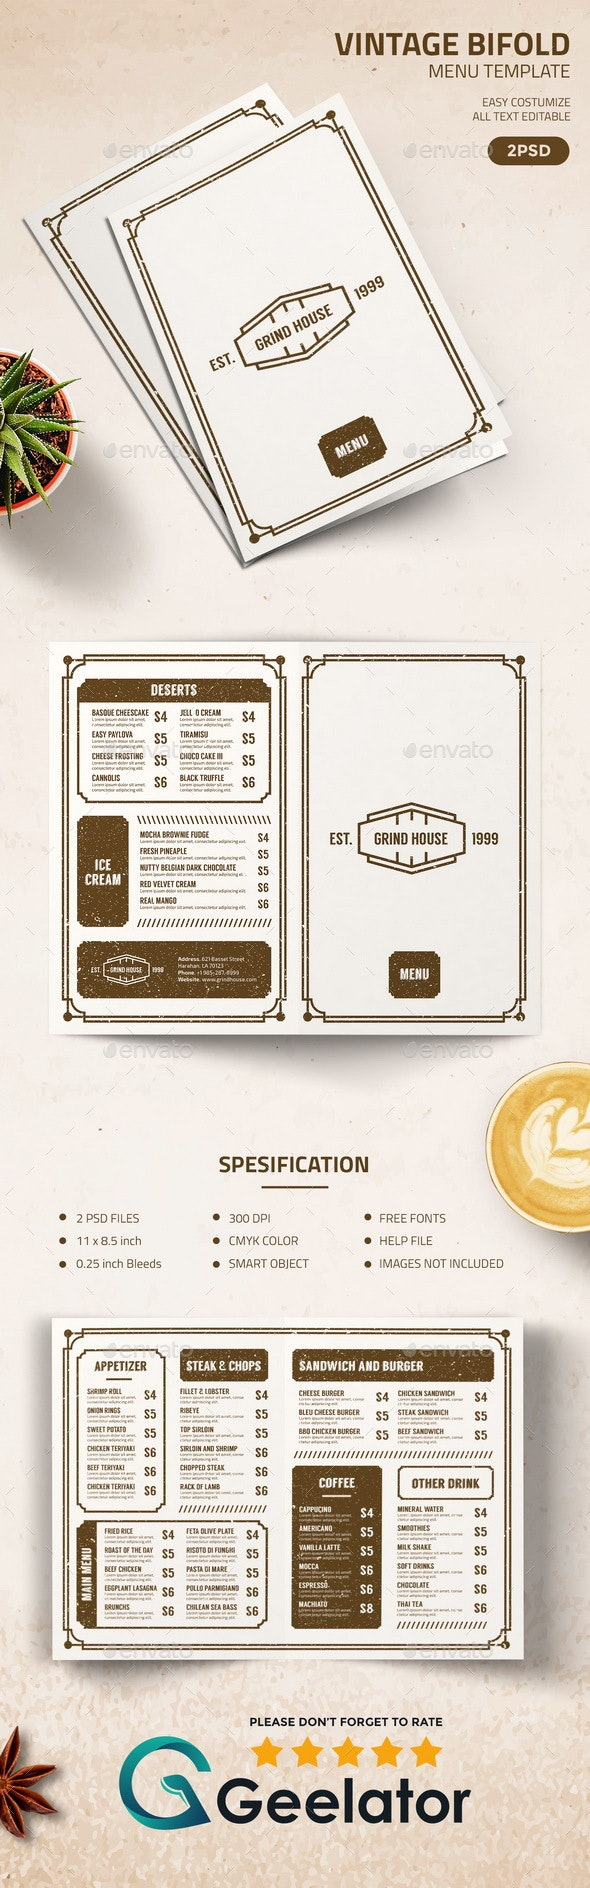 Vintage BiFold Menu Template - Food Menus Print Templates